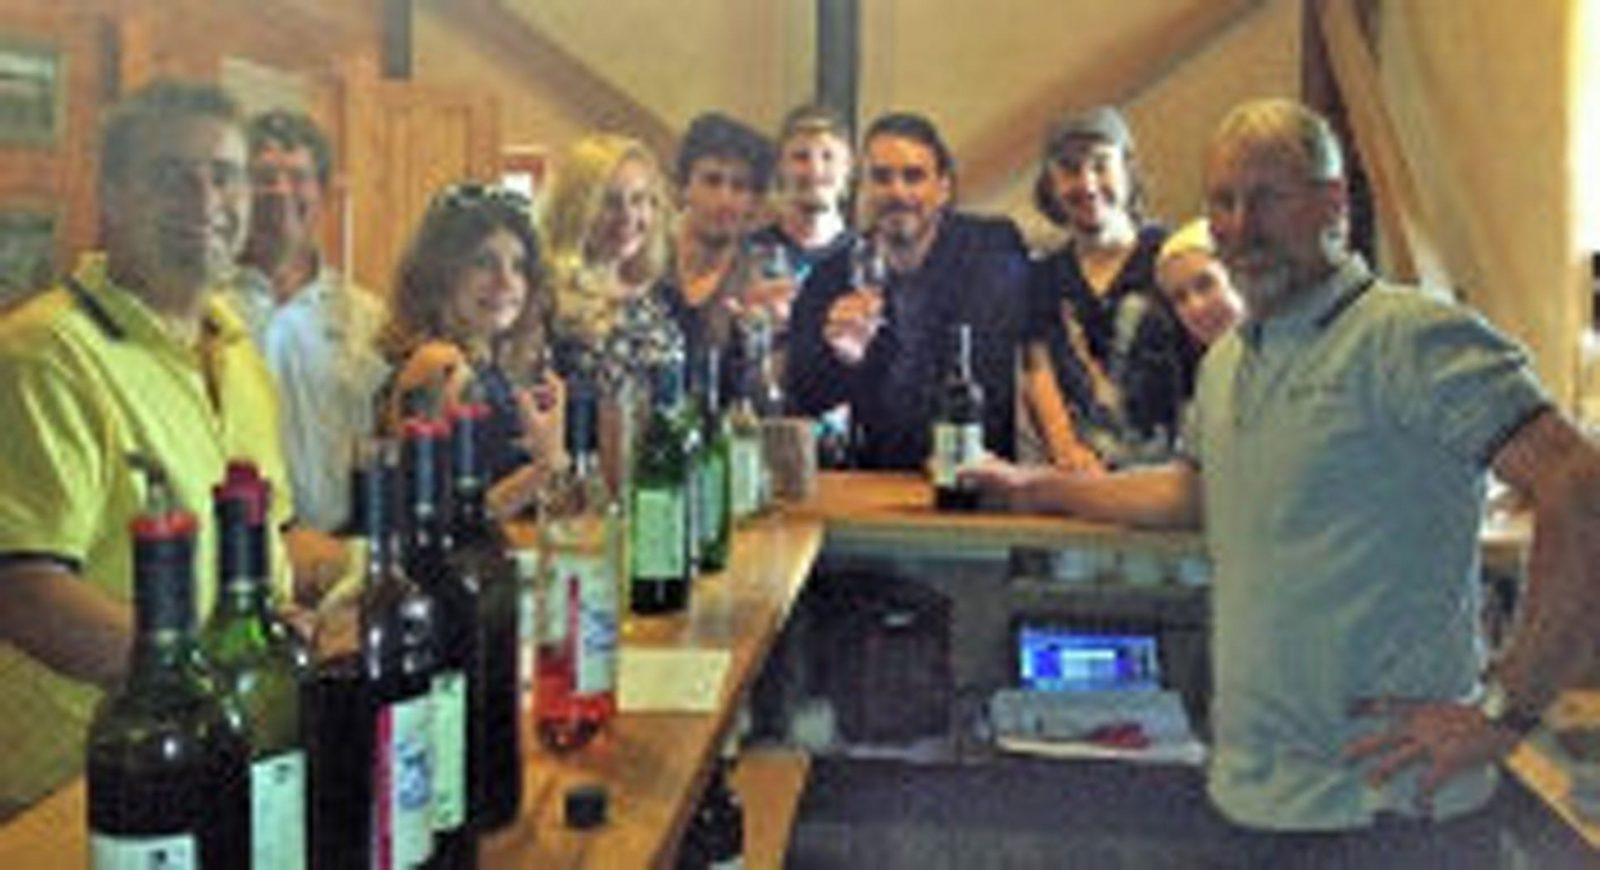 Wine tasting in the wine shop